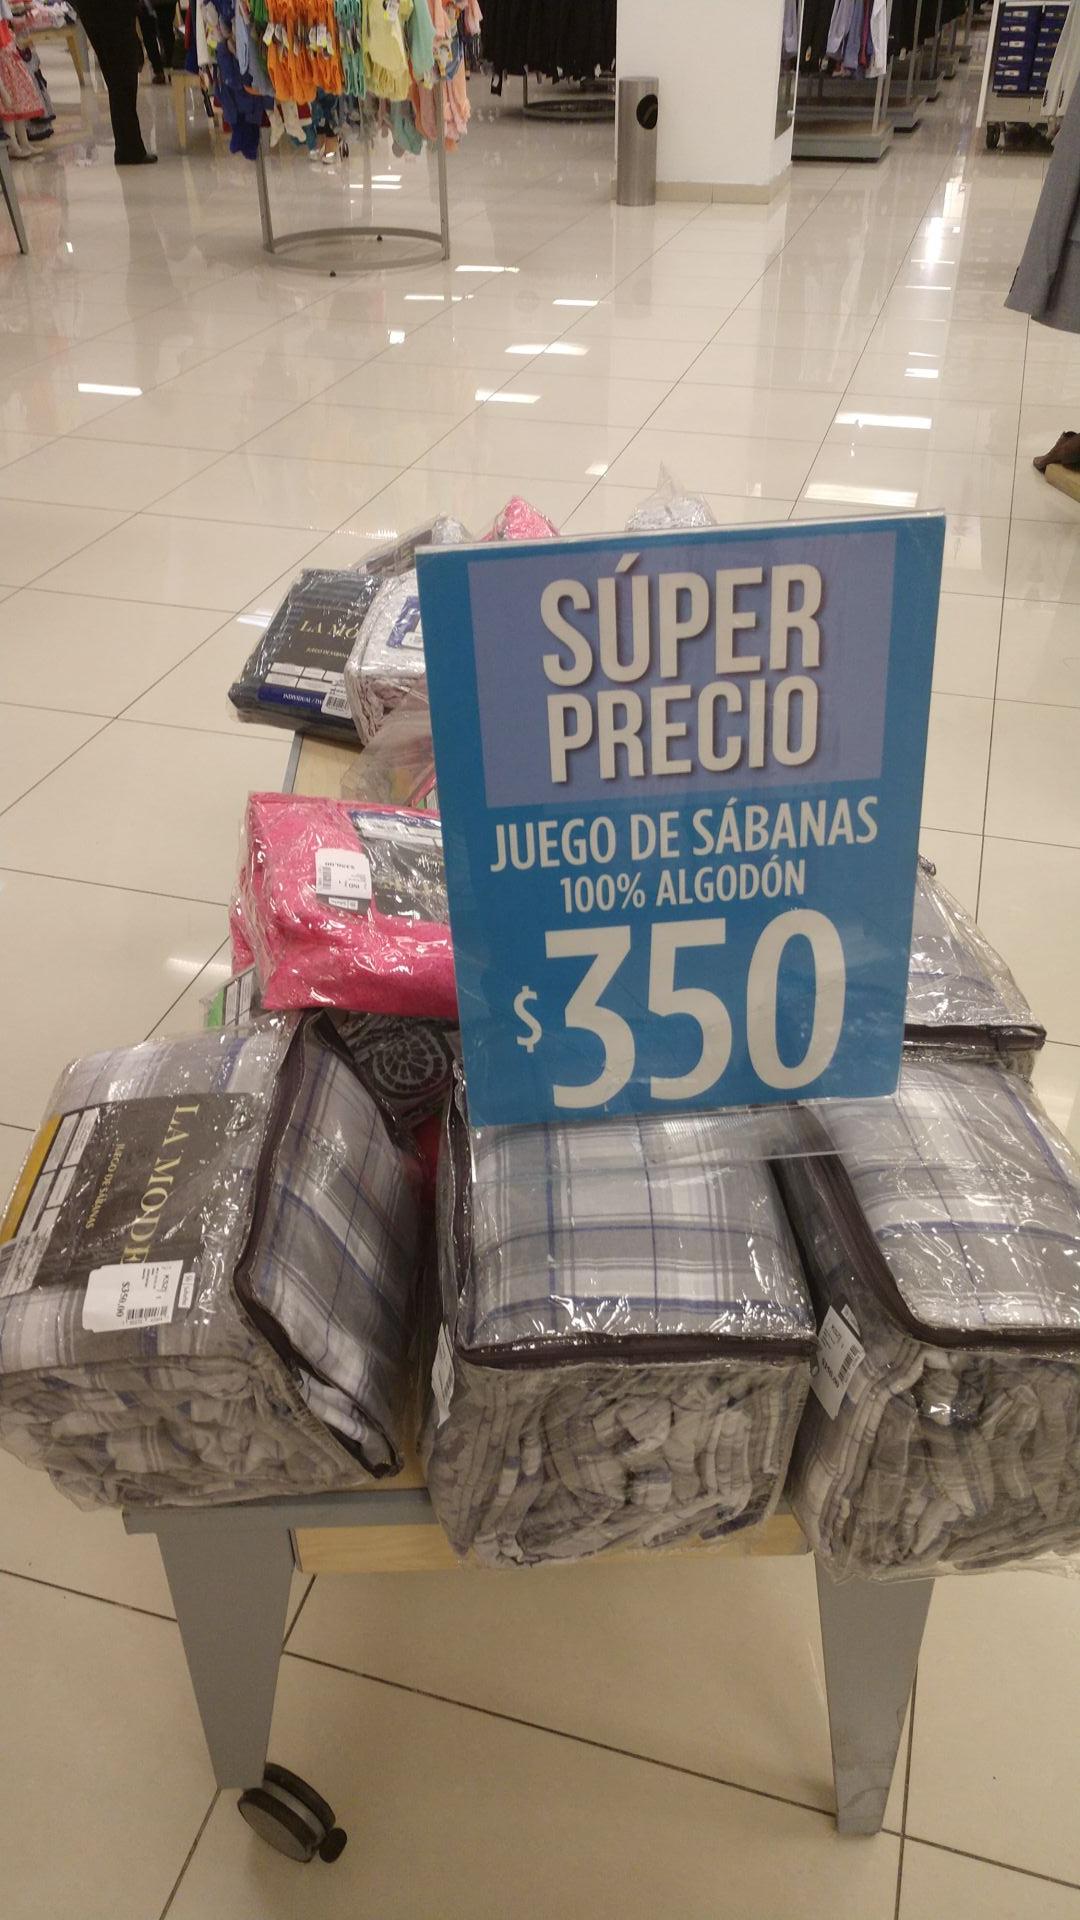 Suburbia: Juego de sábanas 100% algodon (a $315 presentando membresía Sam's Benefits)